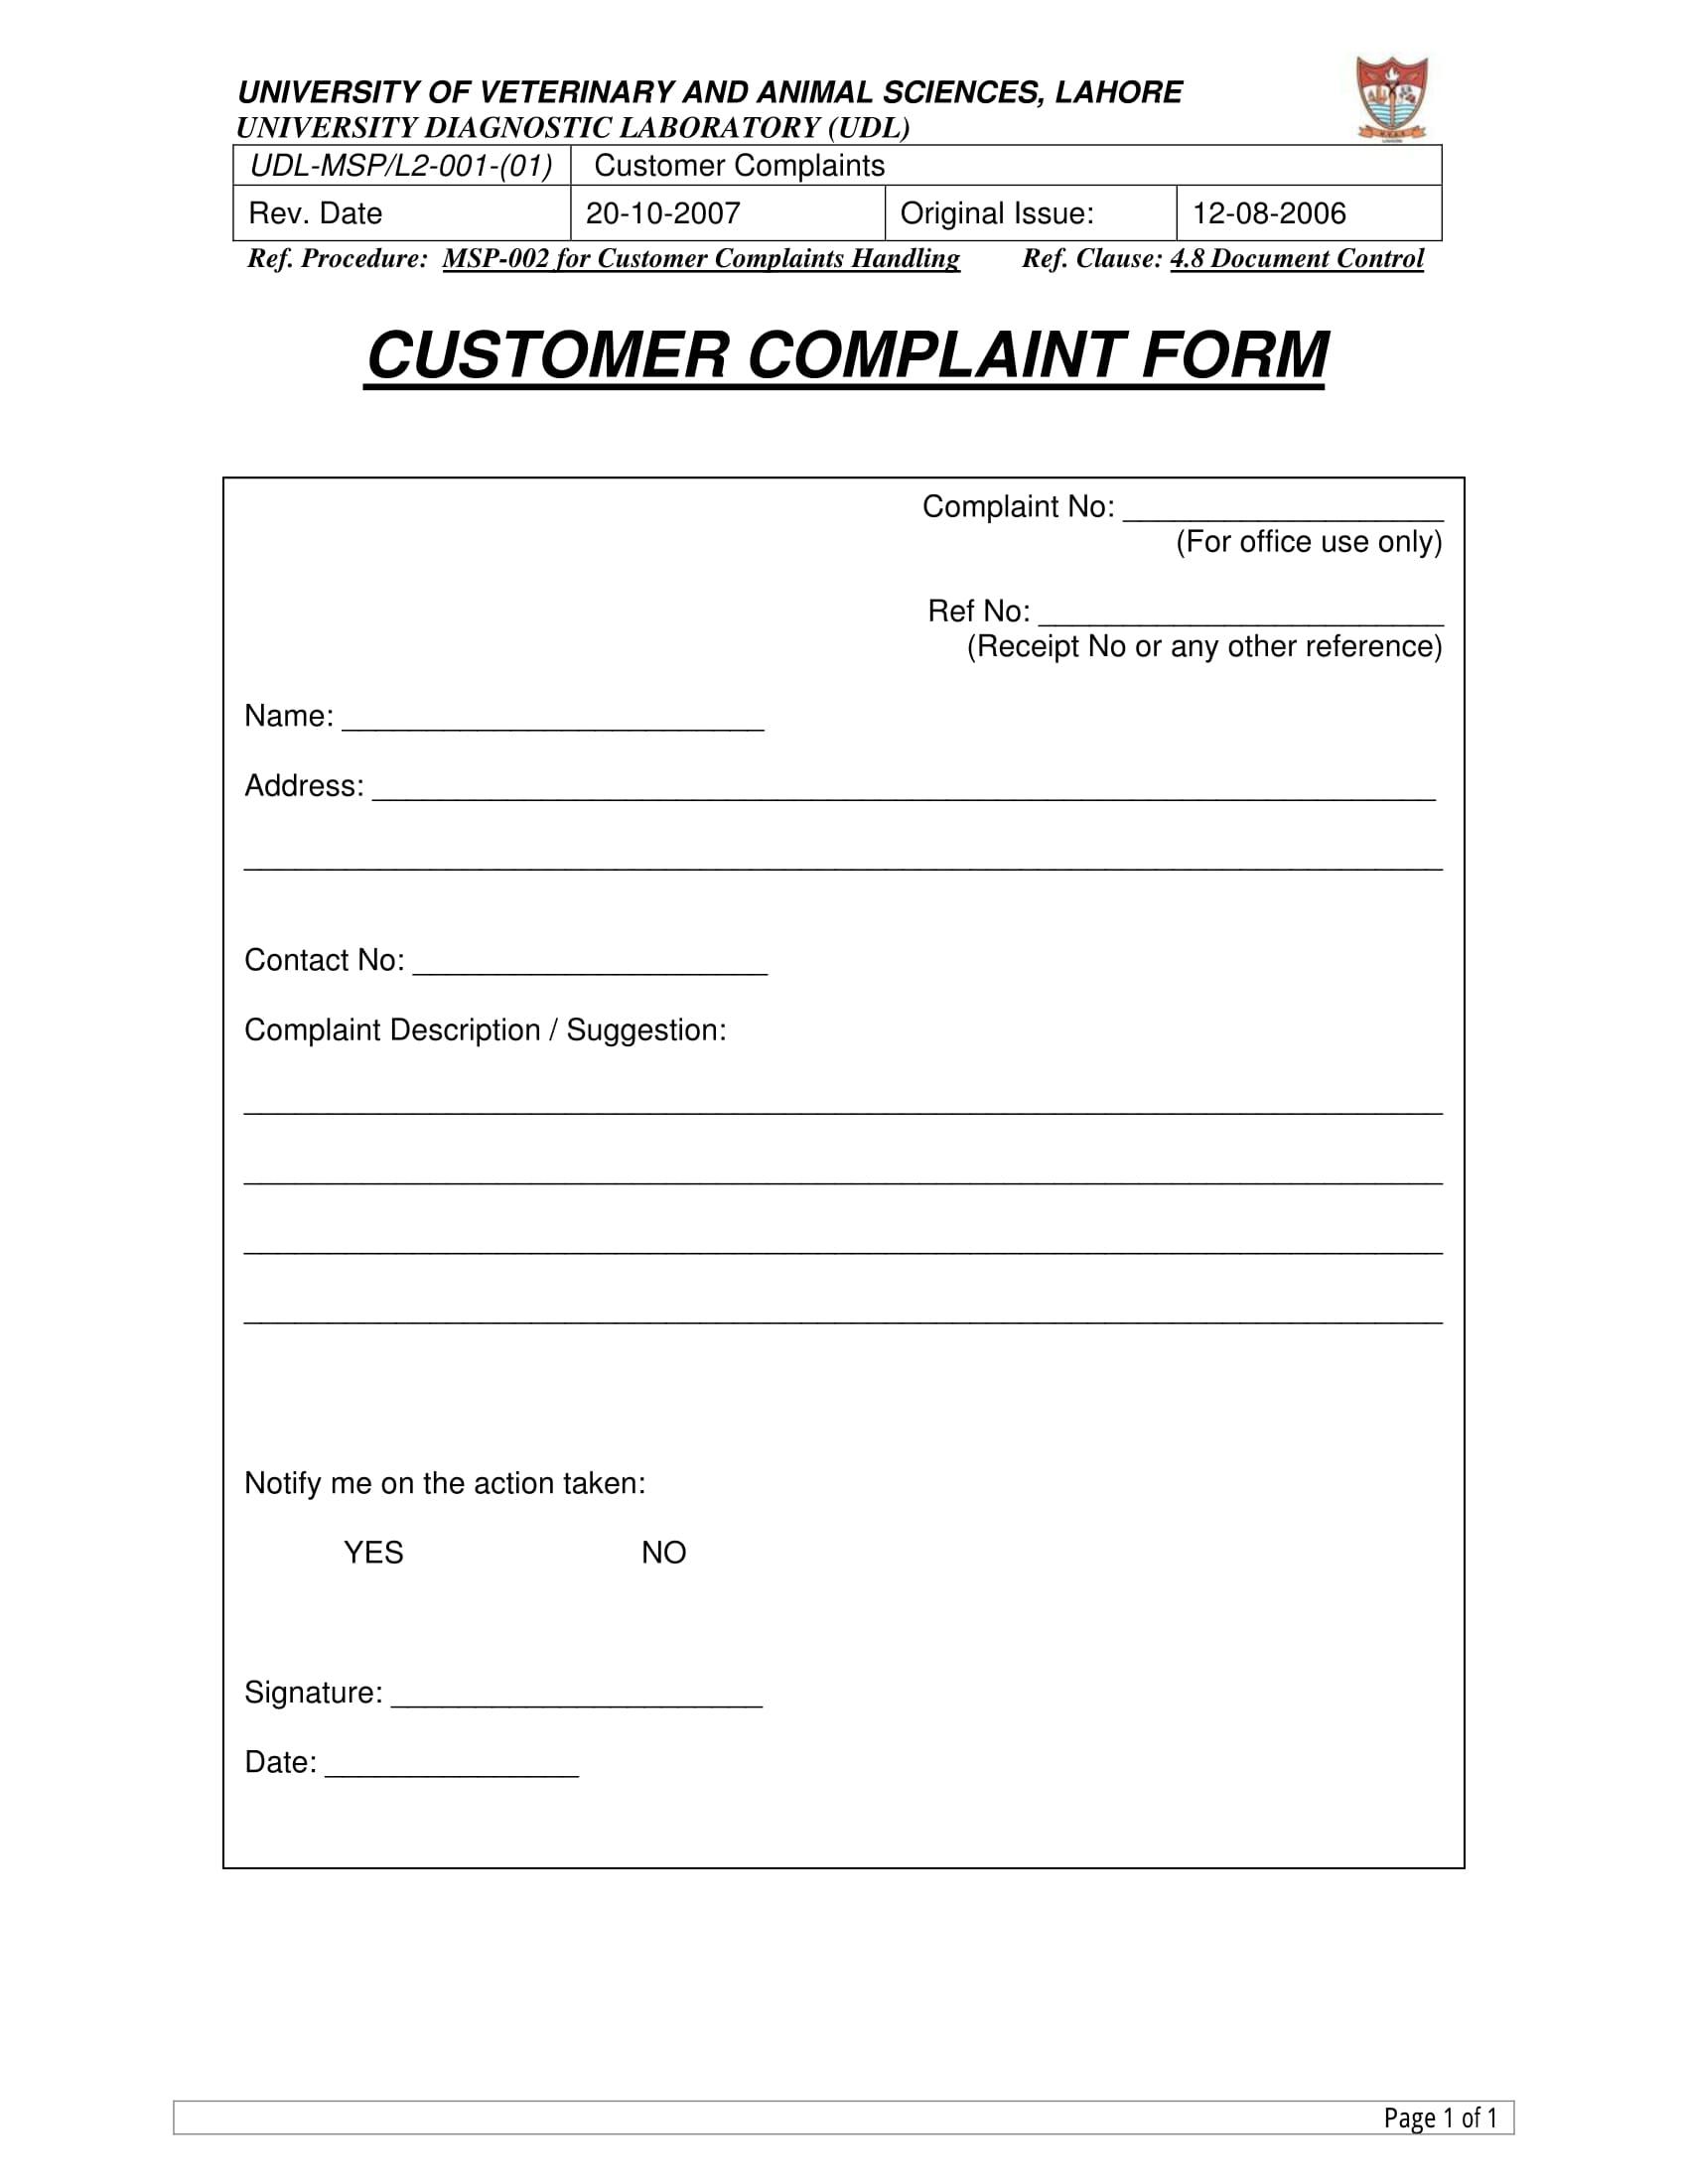 laboratory customer complaint form 1